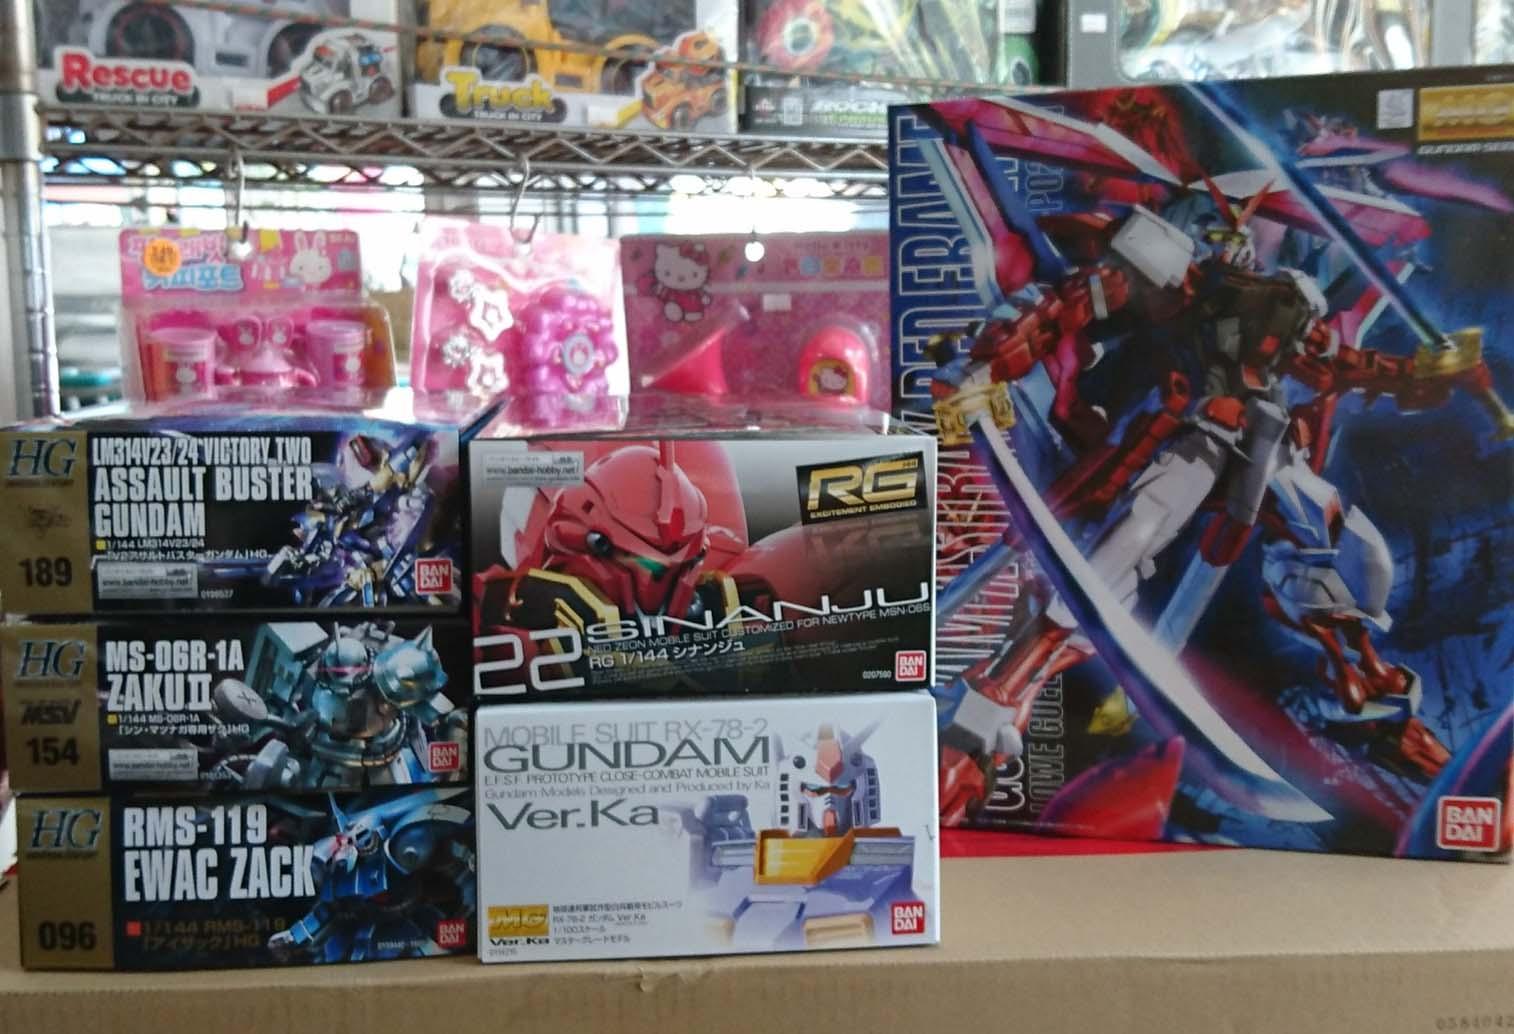 HGUC、MG、RG 系列商品,益祥模型玩具 外盒實際拍紹照片。